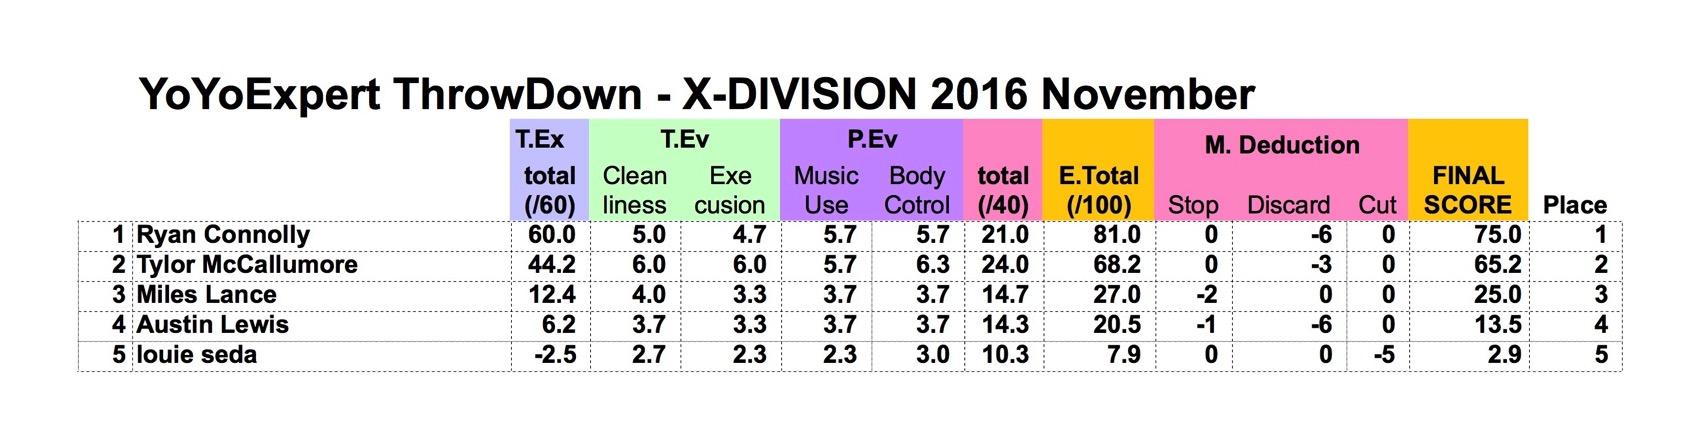 2016 November YoYoExpert ThrowDown X Division